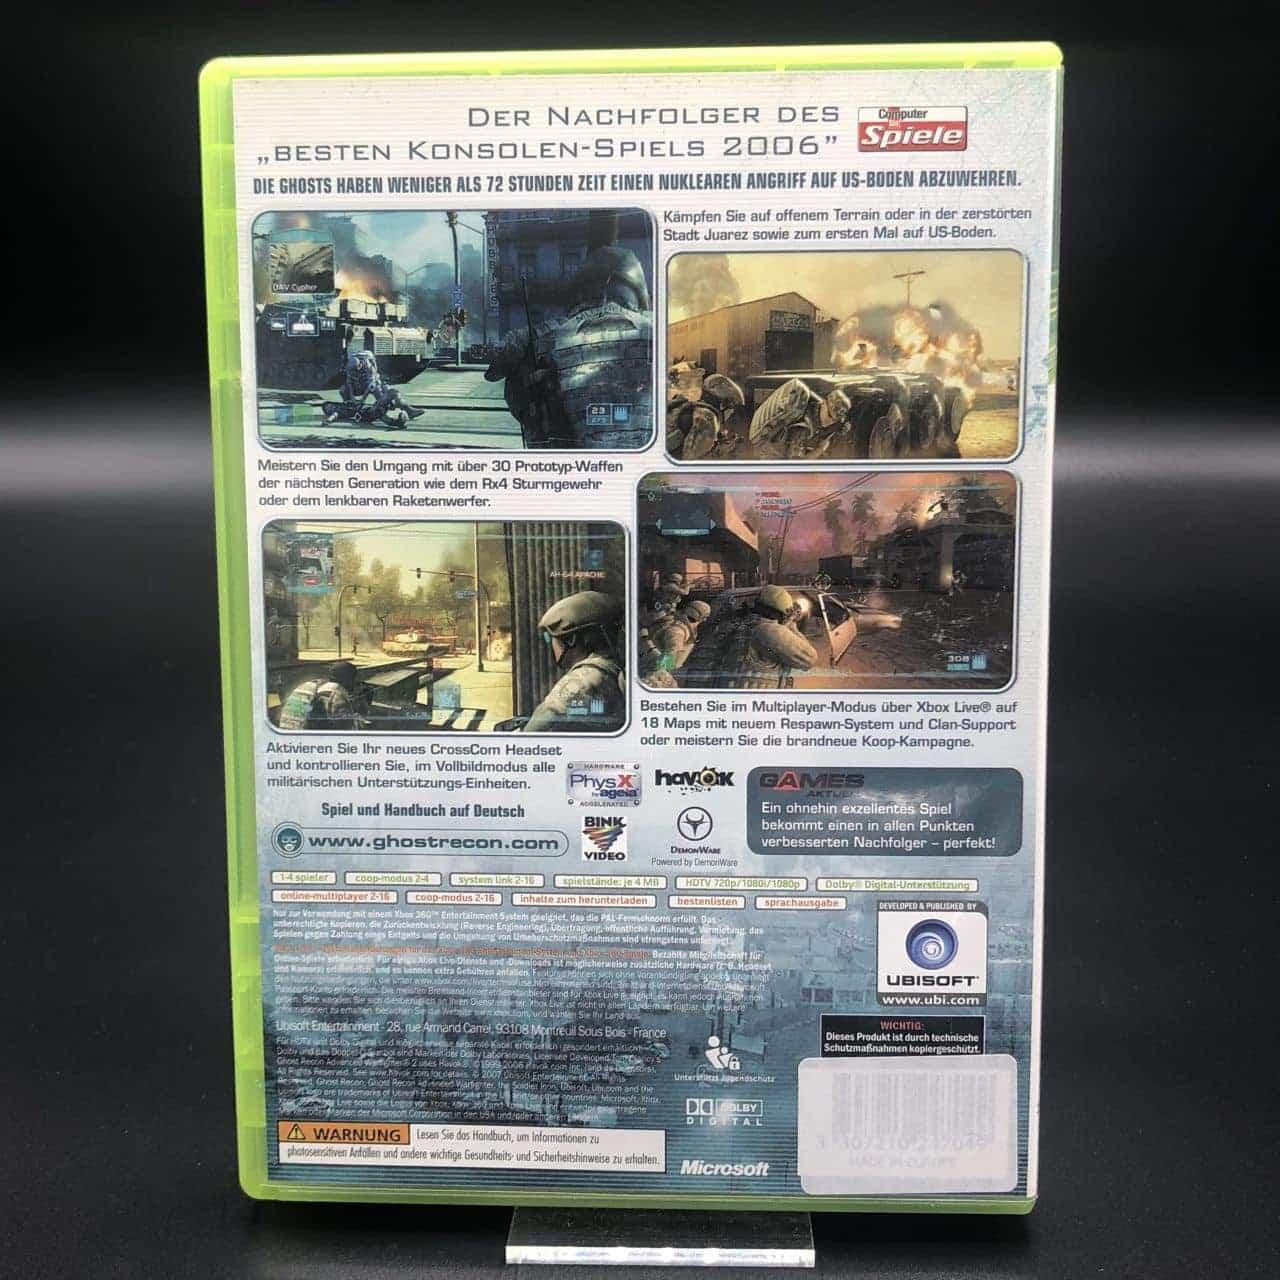 Tom Clancy's Ghost Recon Advanced Warfighter 2 (Komplett) (Sehr gut) Xbox 360 (FSK18)